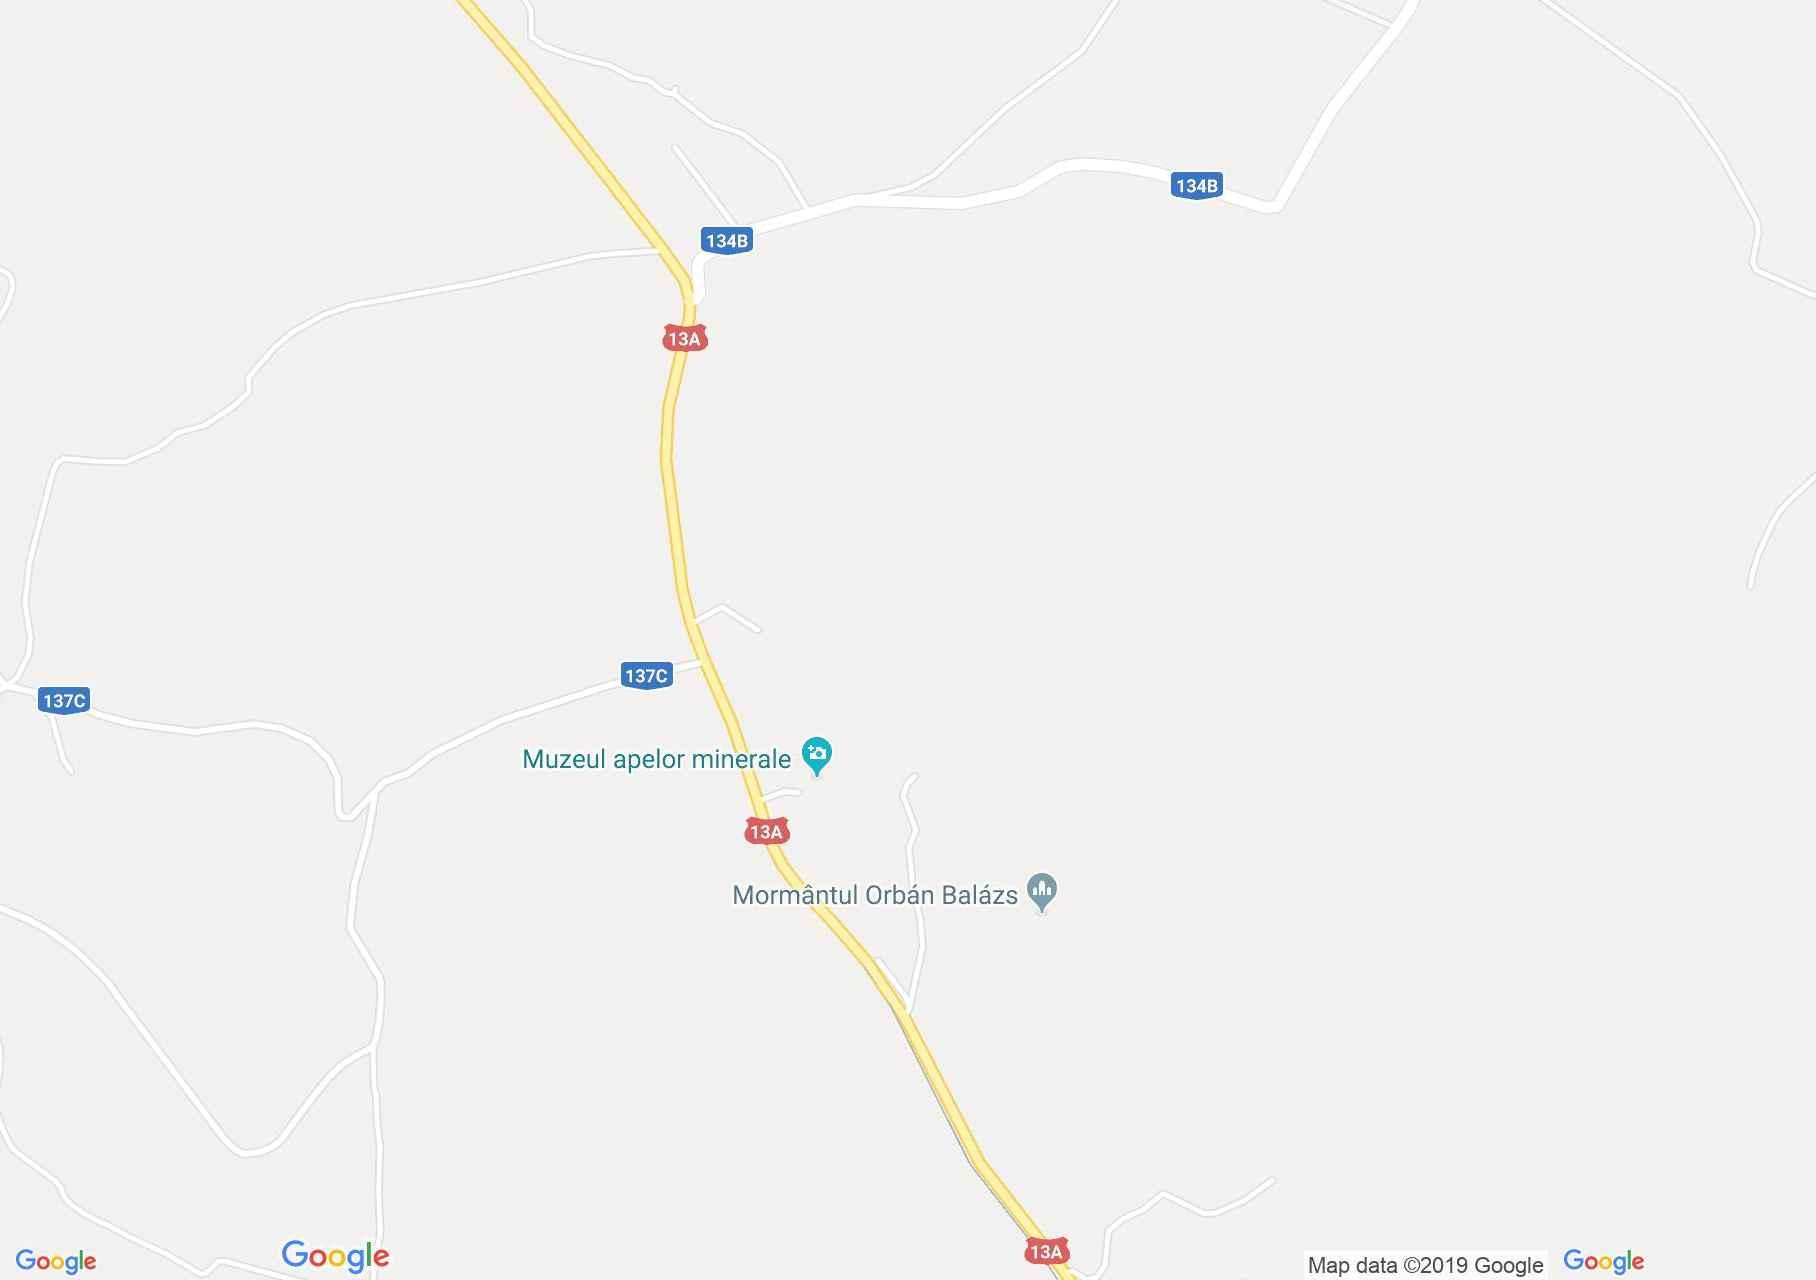 Map of Odorheiu Secuiesc: Szejke Bath, Protected area